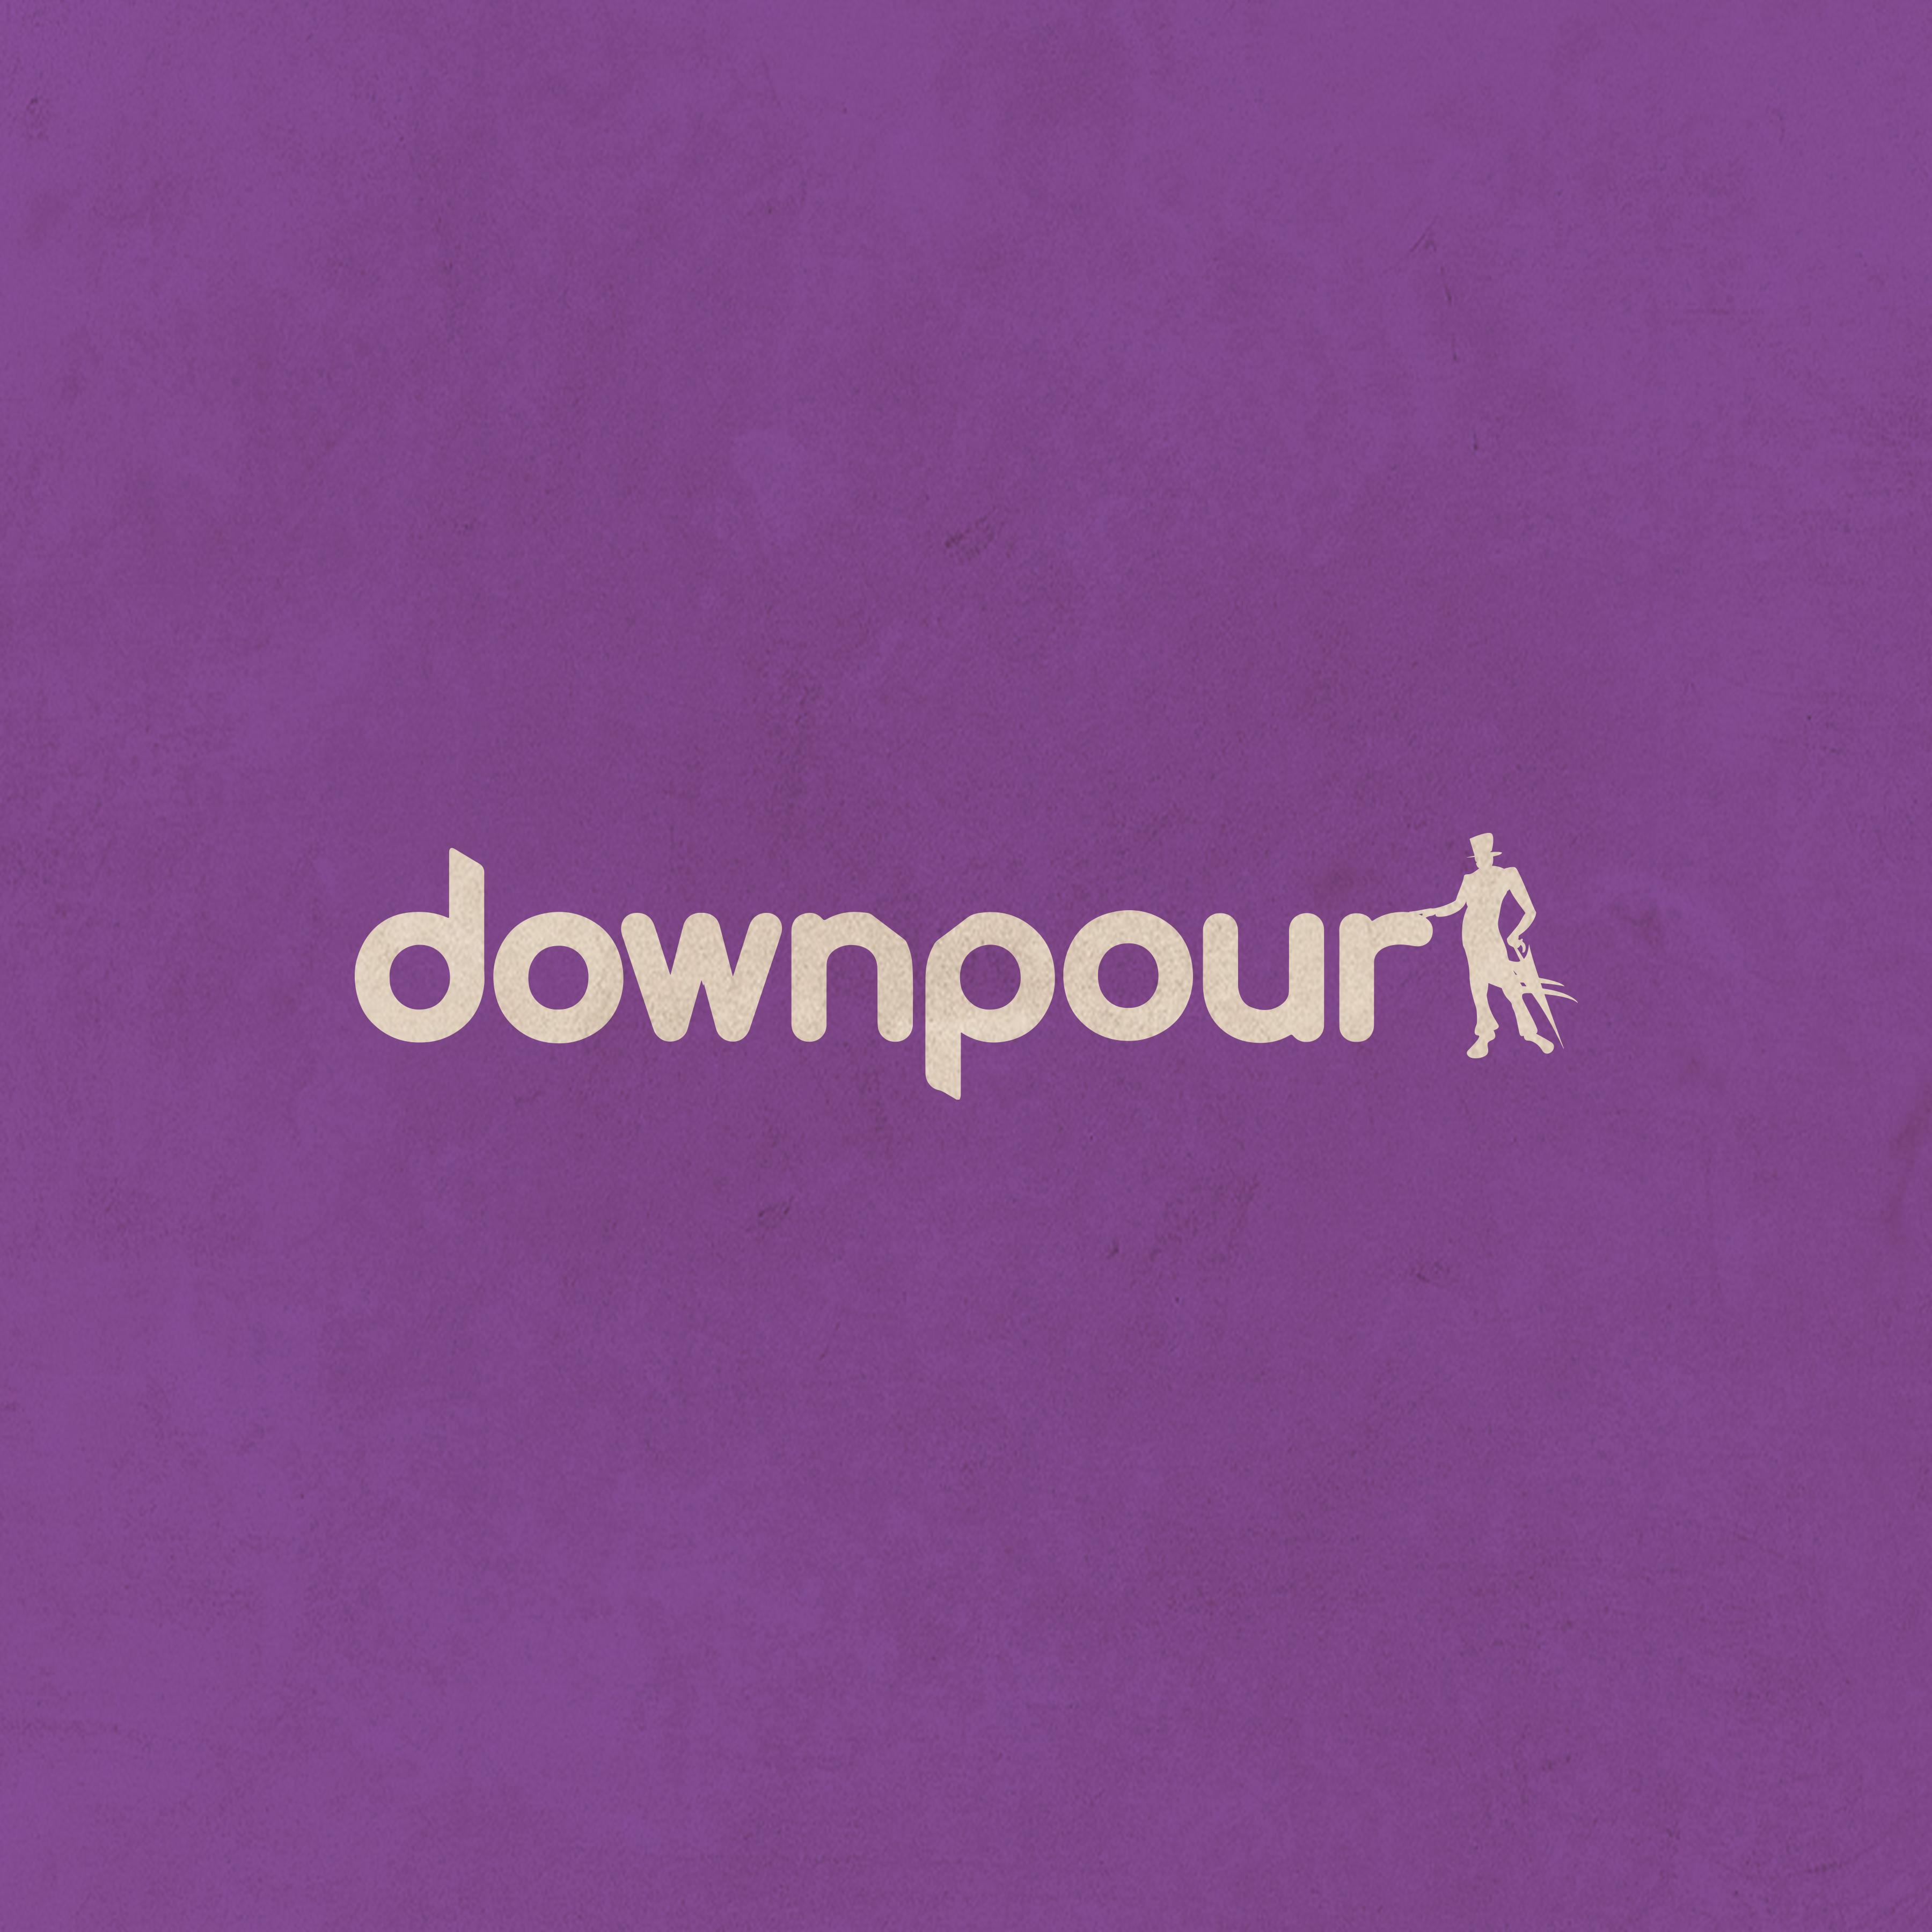 ANerdsWorld_Logos_Downpour